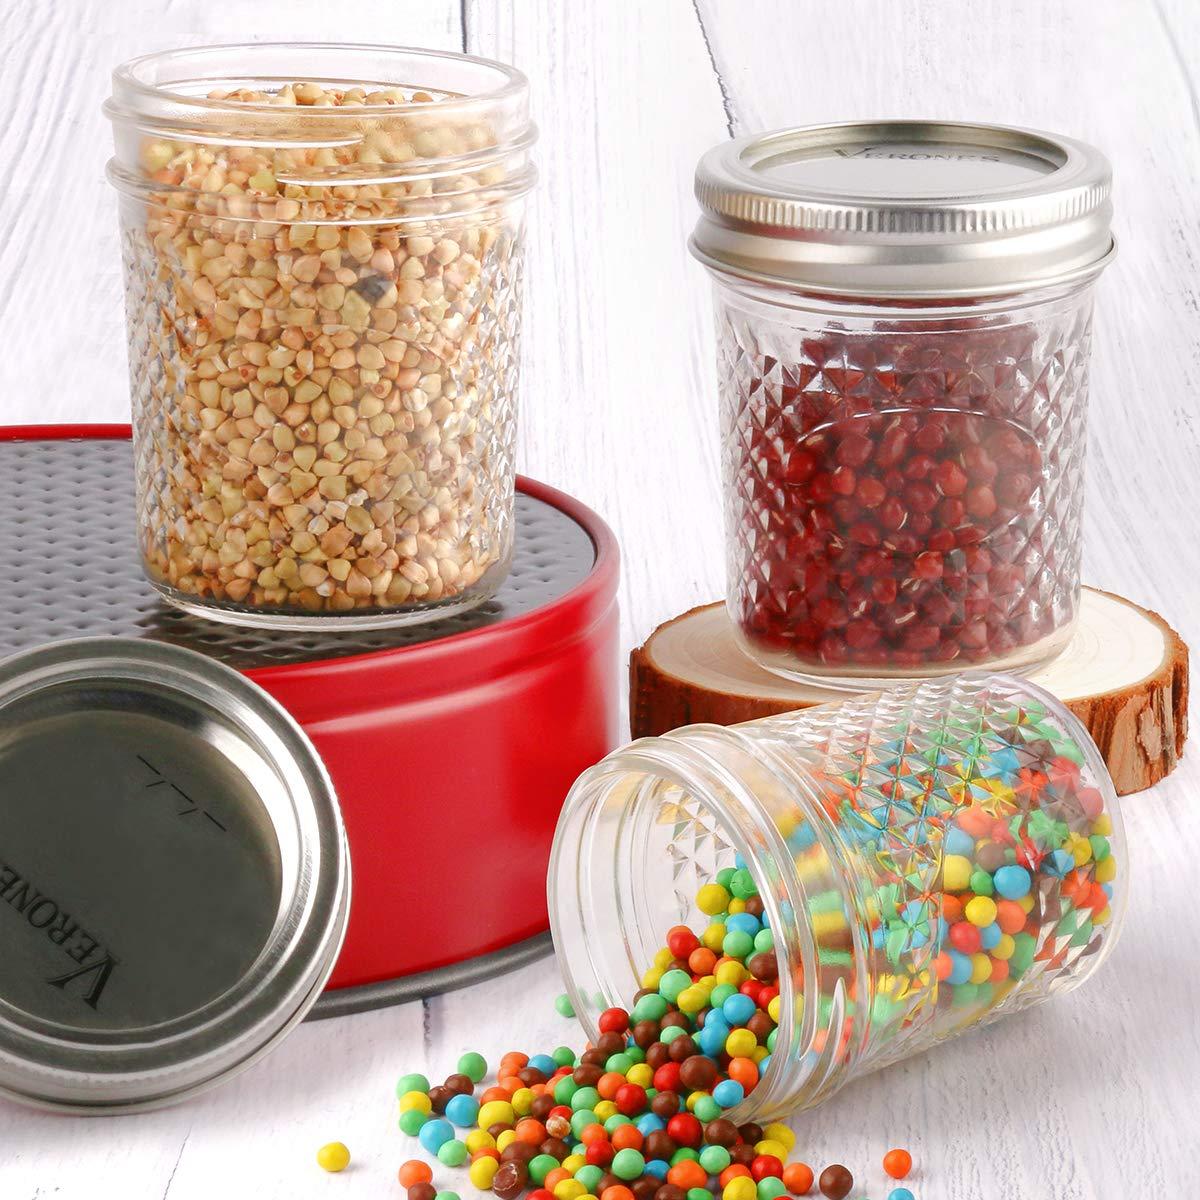 Baby Foods VERONES Canning Jars Jelly Jars With Regular Lids and Bands Ideal for Jam Wedding Favors Honey Mason Jars 12 OZ 15 PACK Shower Favors